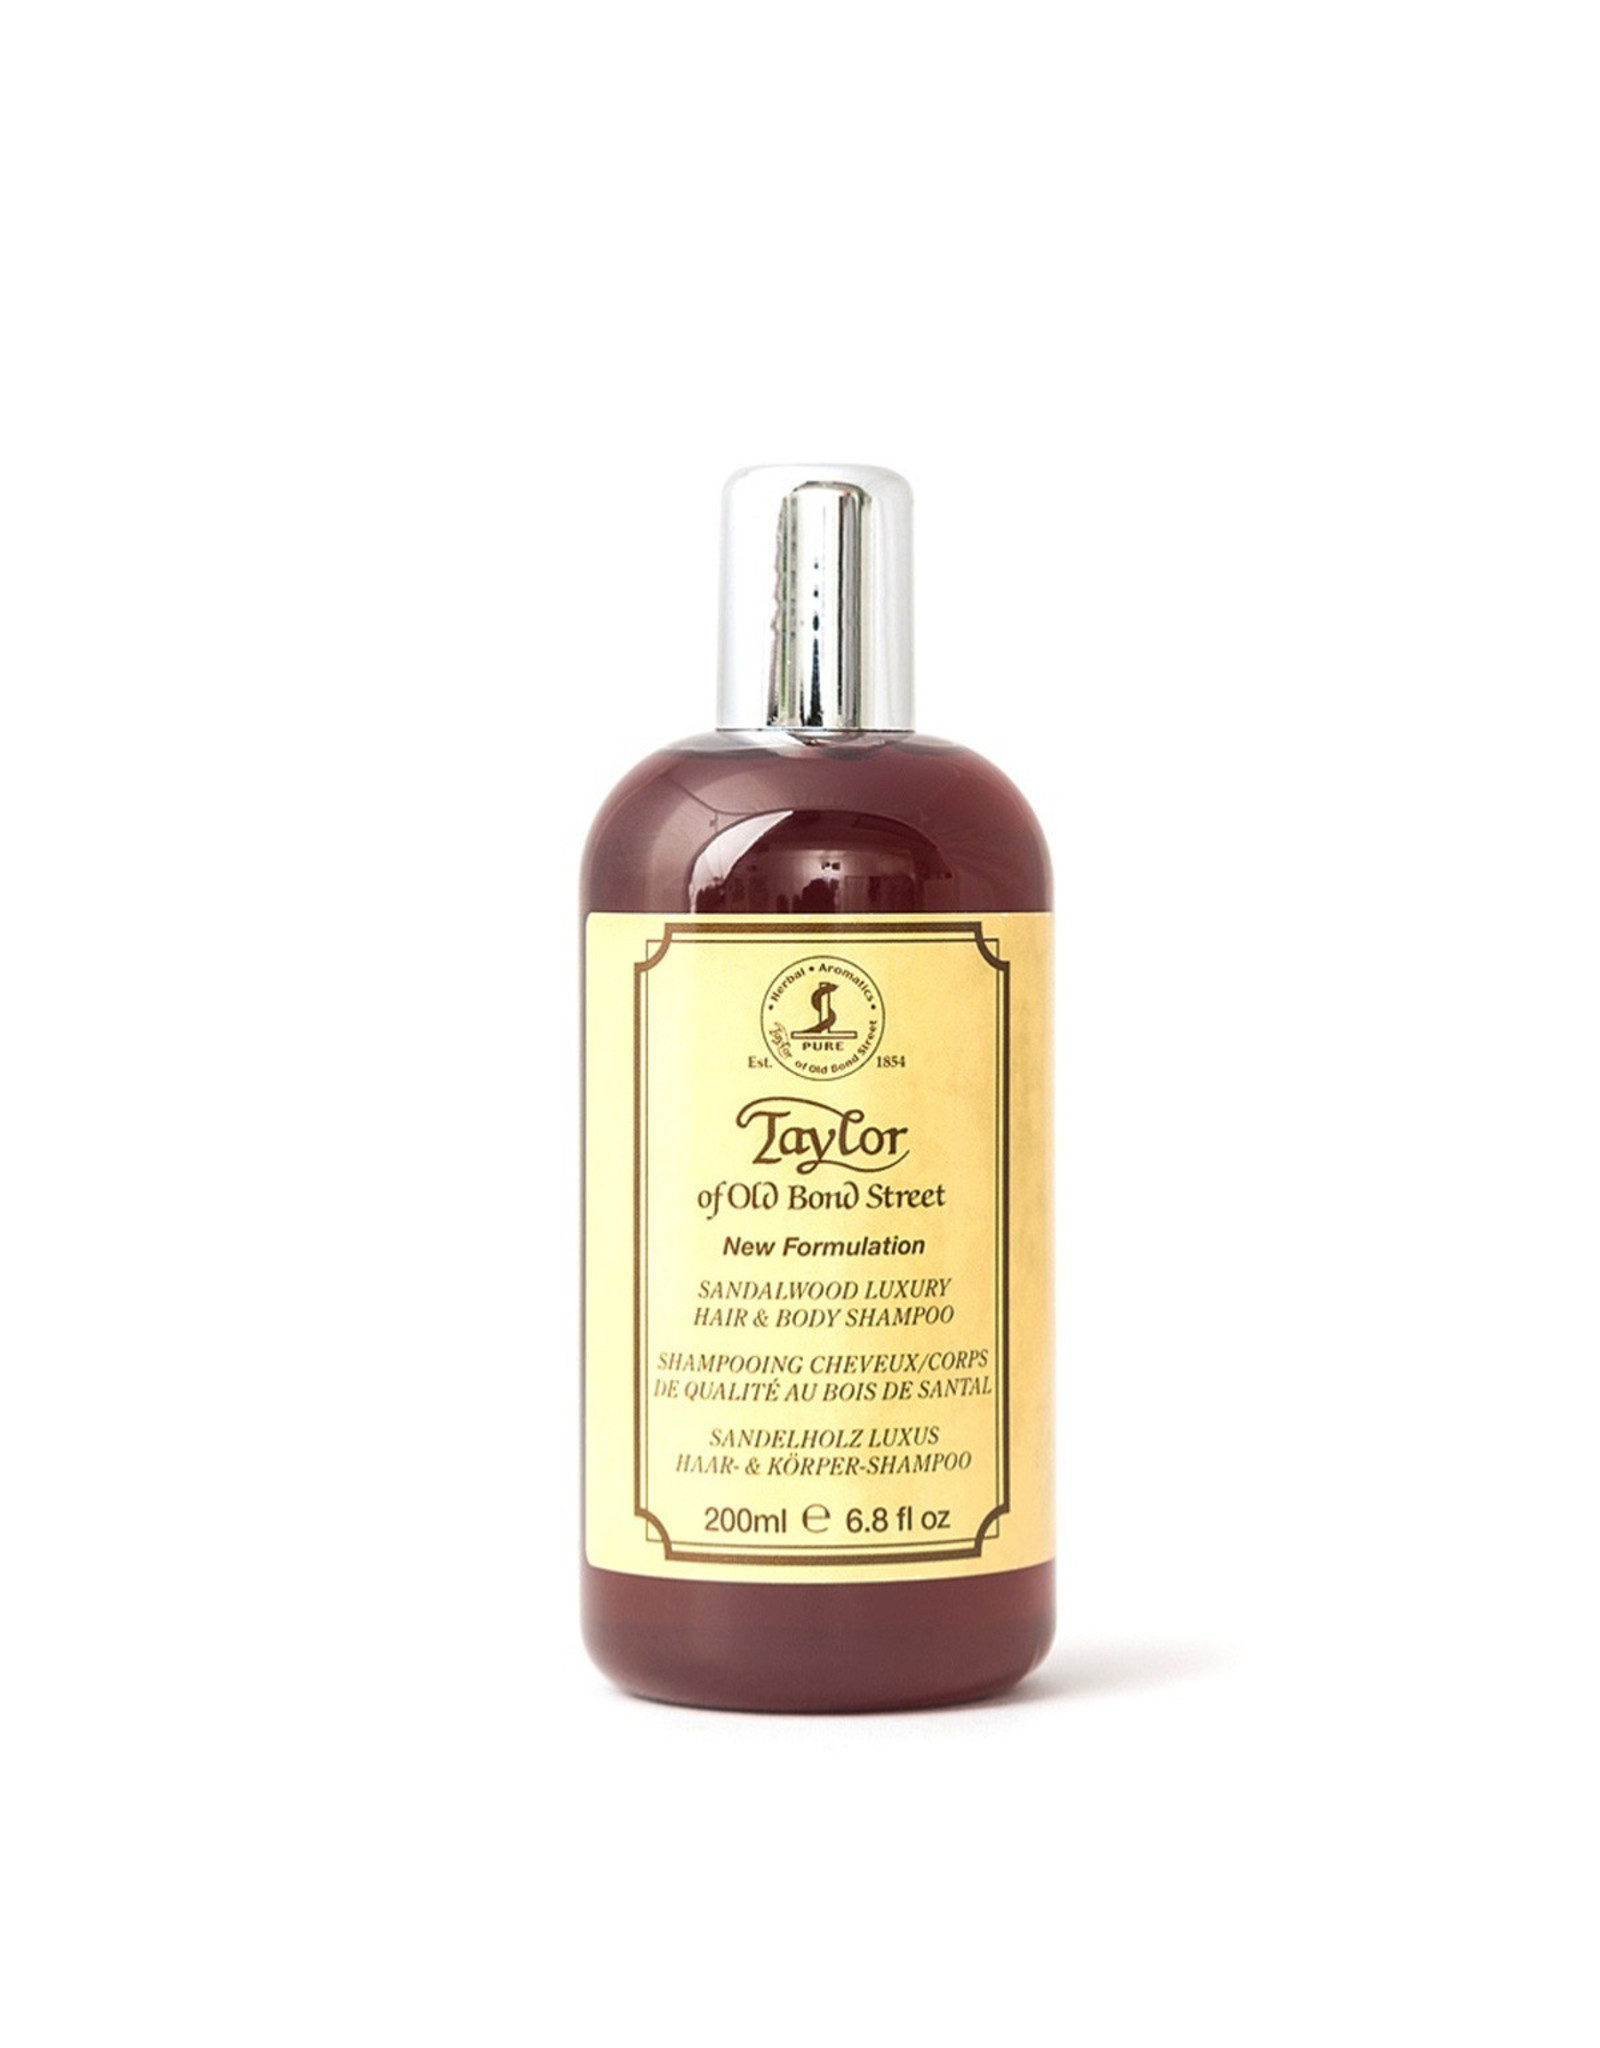 Taylor of Old Bond Street Hair & Body Shampoo 100ml Sandalwood